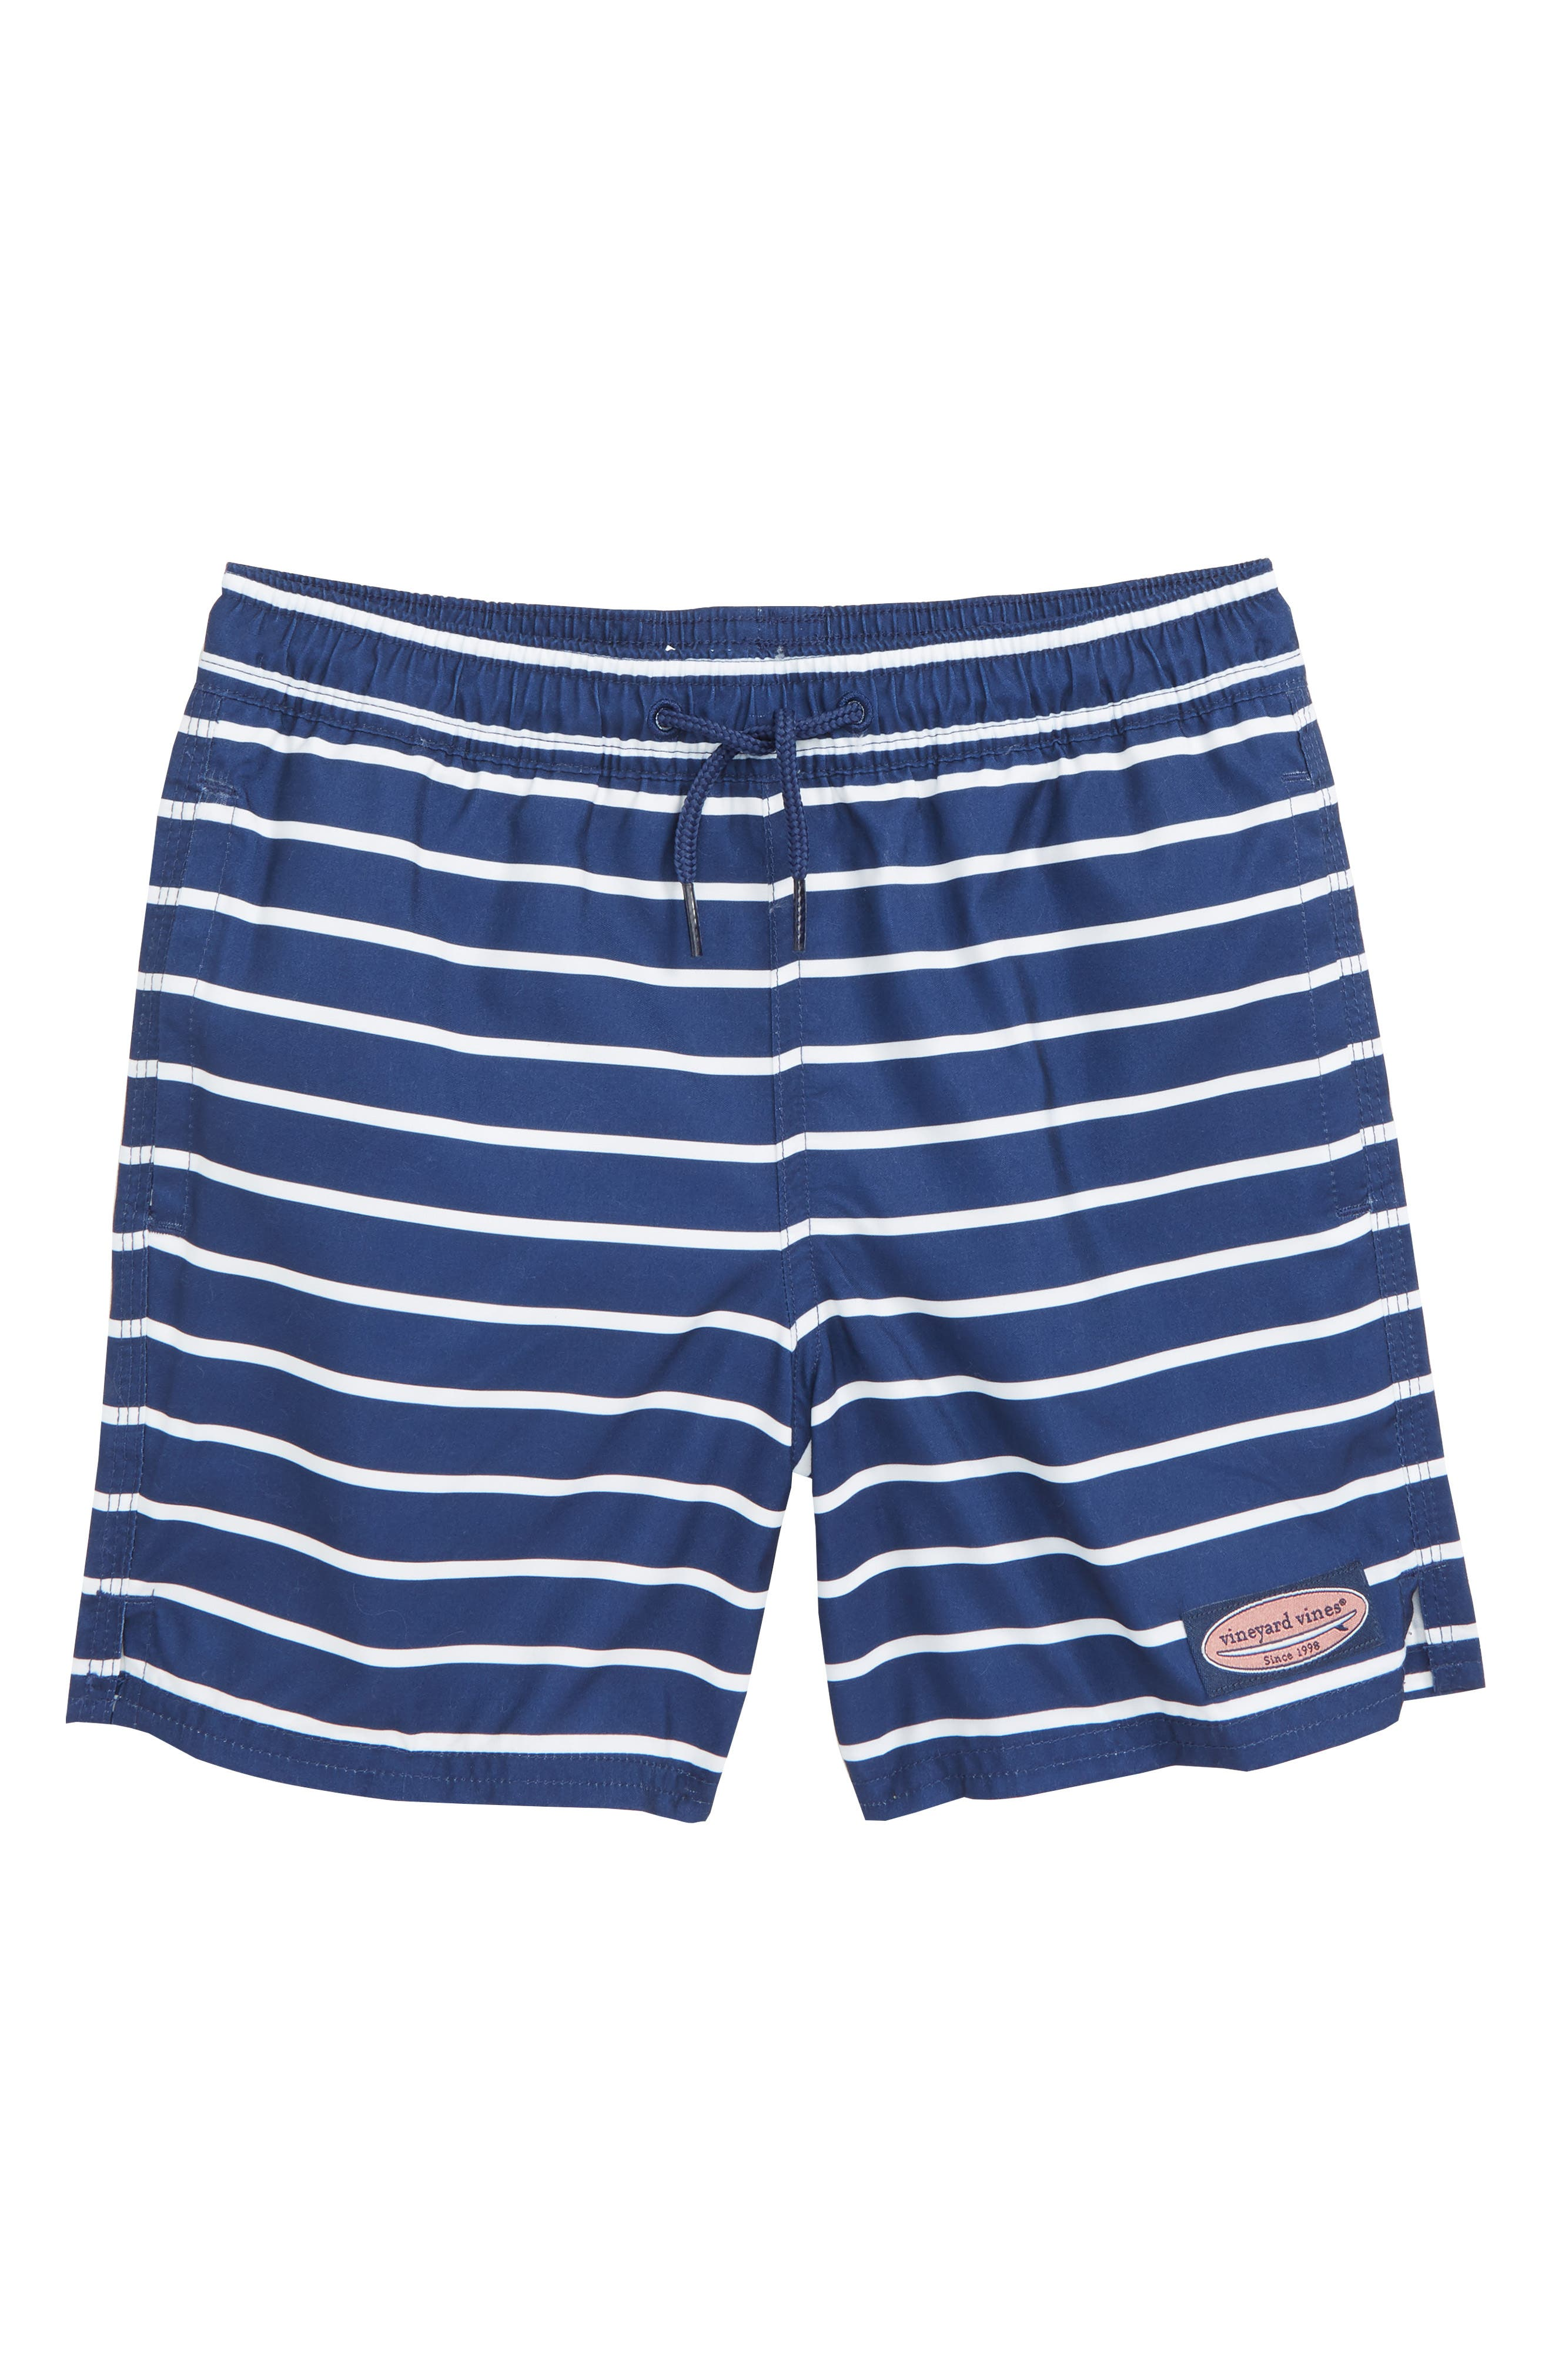 VINEYARD VINES,                             Break Stripe Chappy Swim Trunks,                             Main thumbnail 1, color,                             DEEP BAY